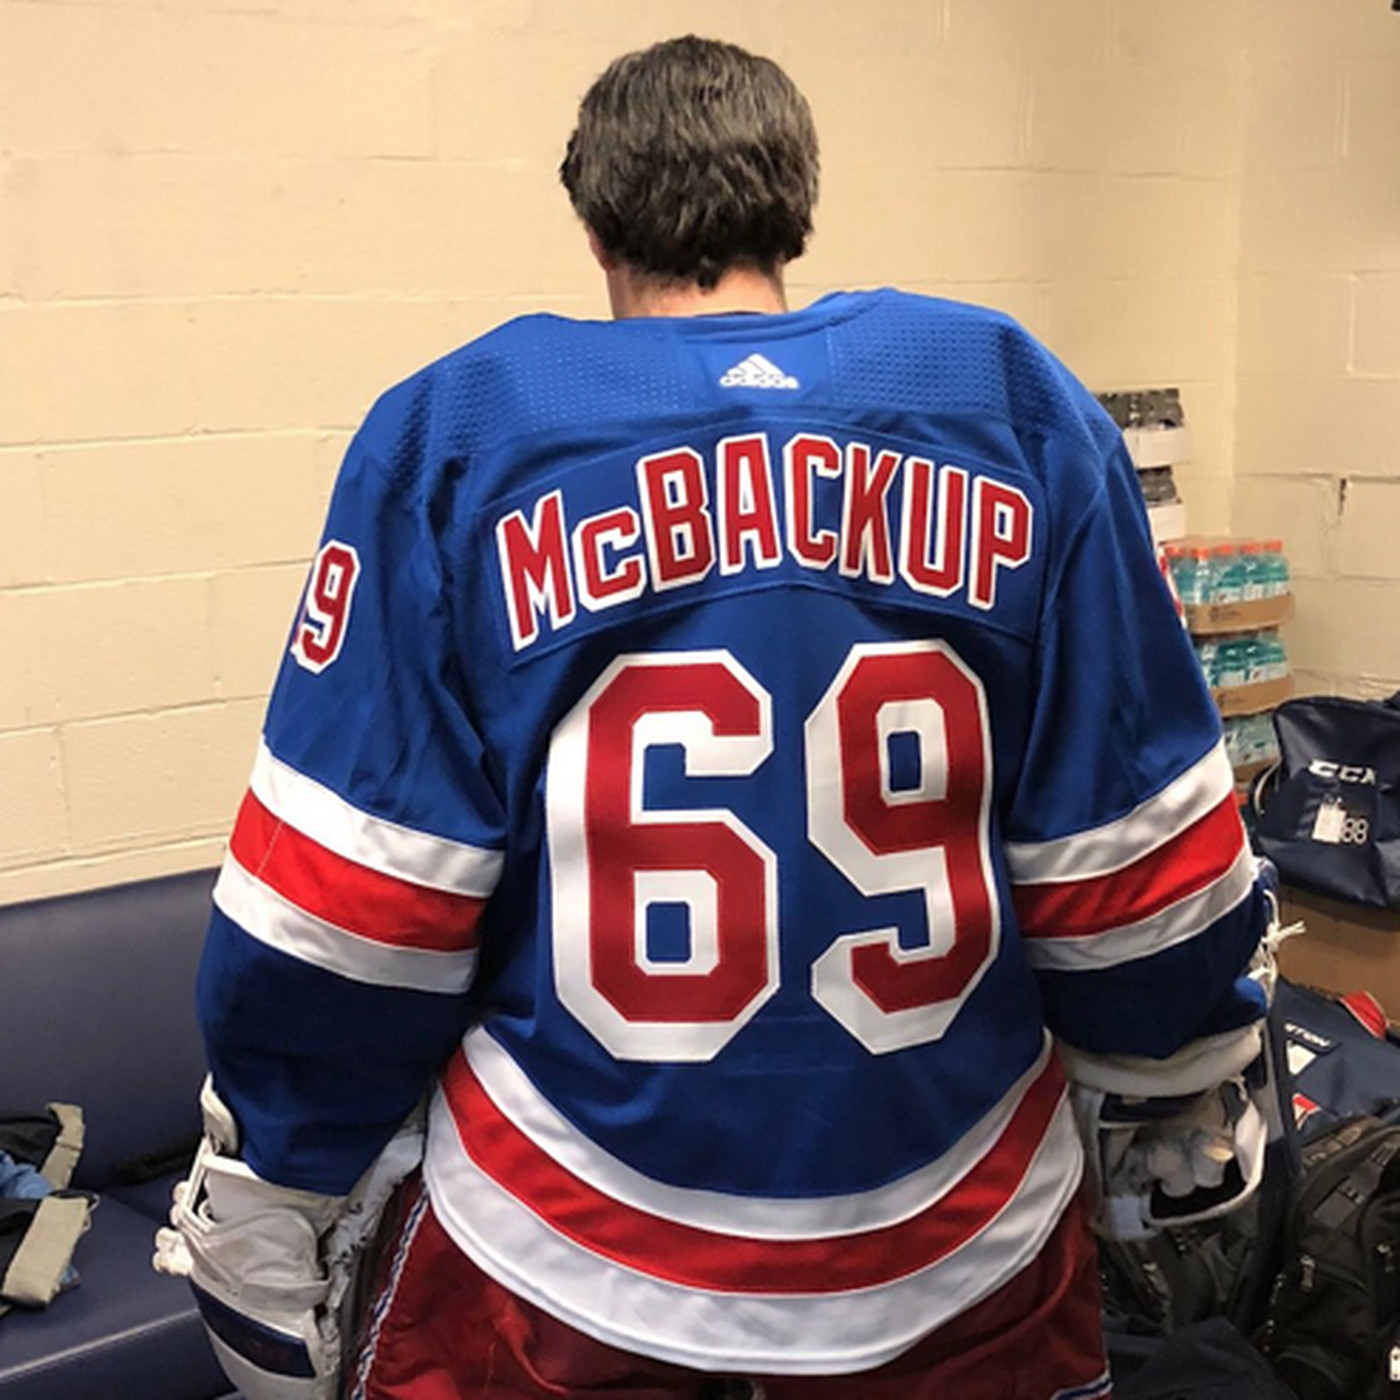 Rangers make their emergency goalie wear a No. 69  McBackup  uniform -  SBNation.com a25010c48